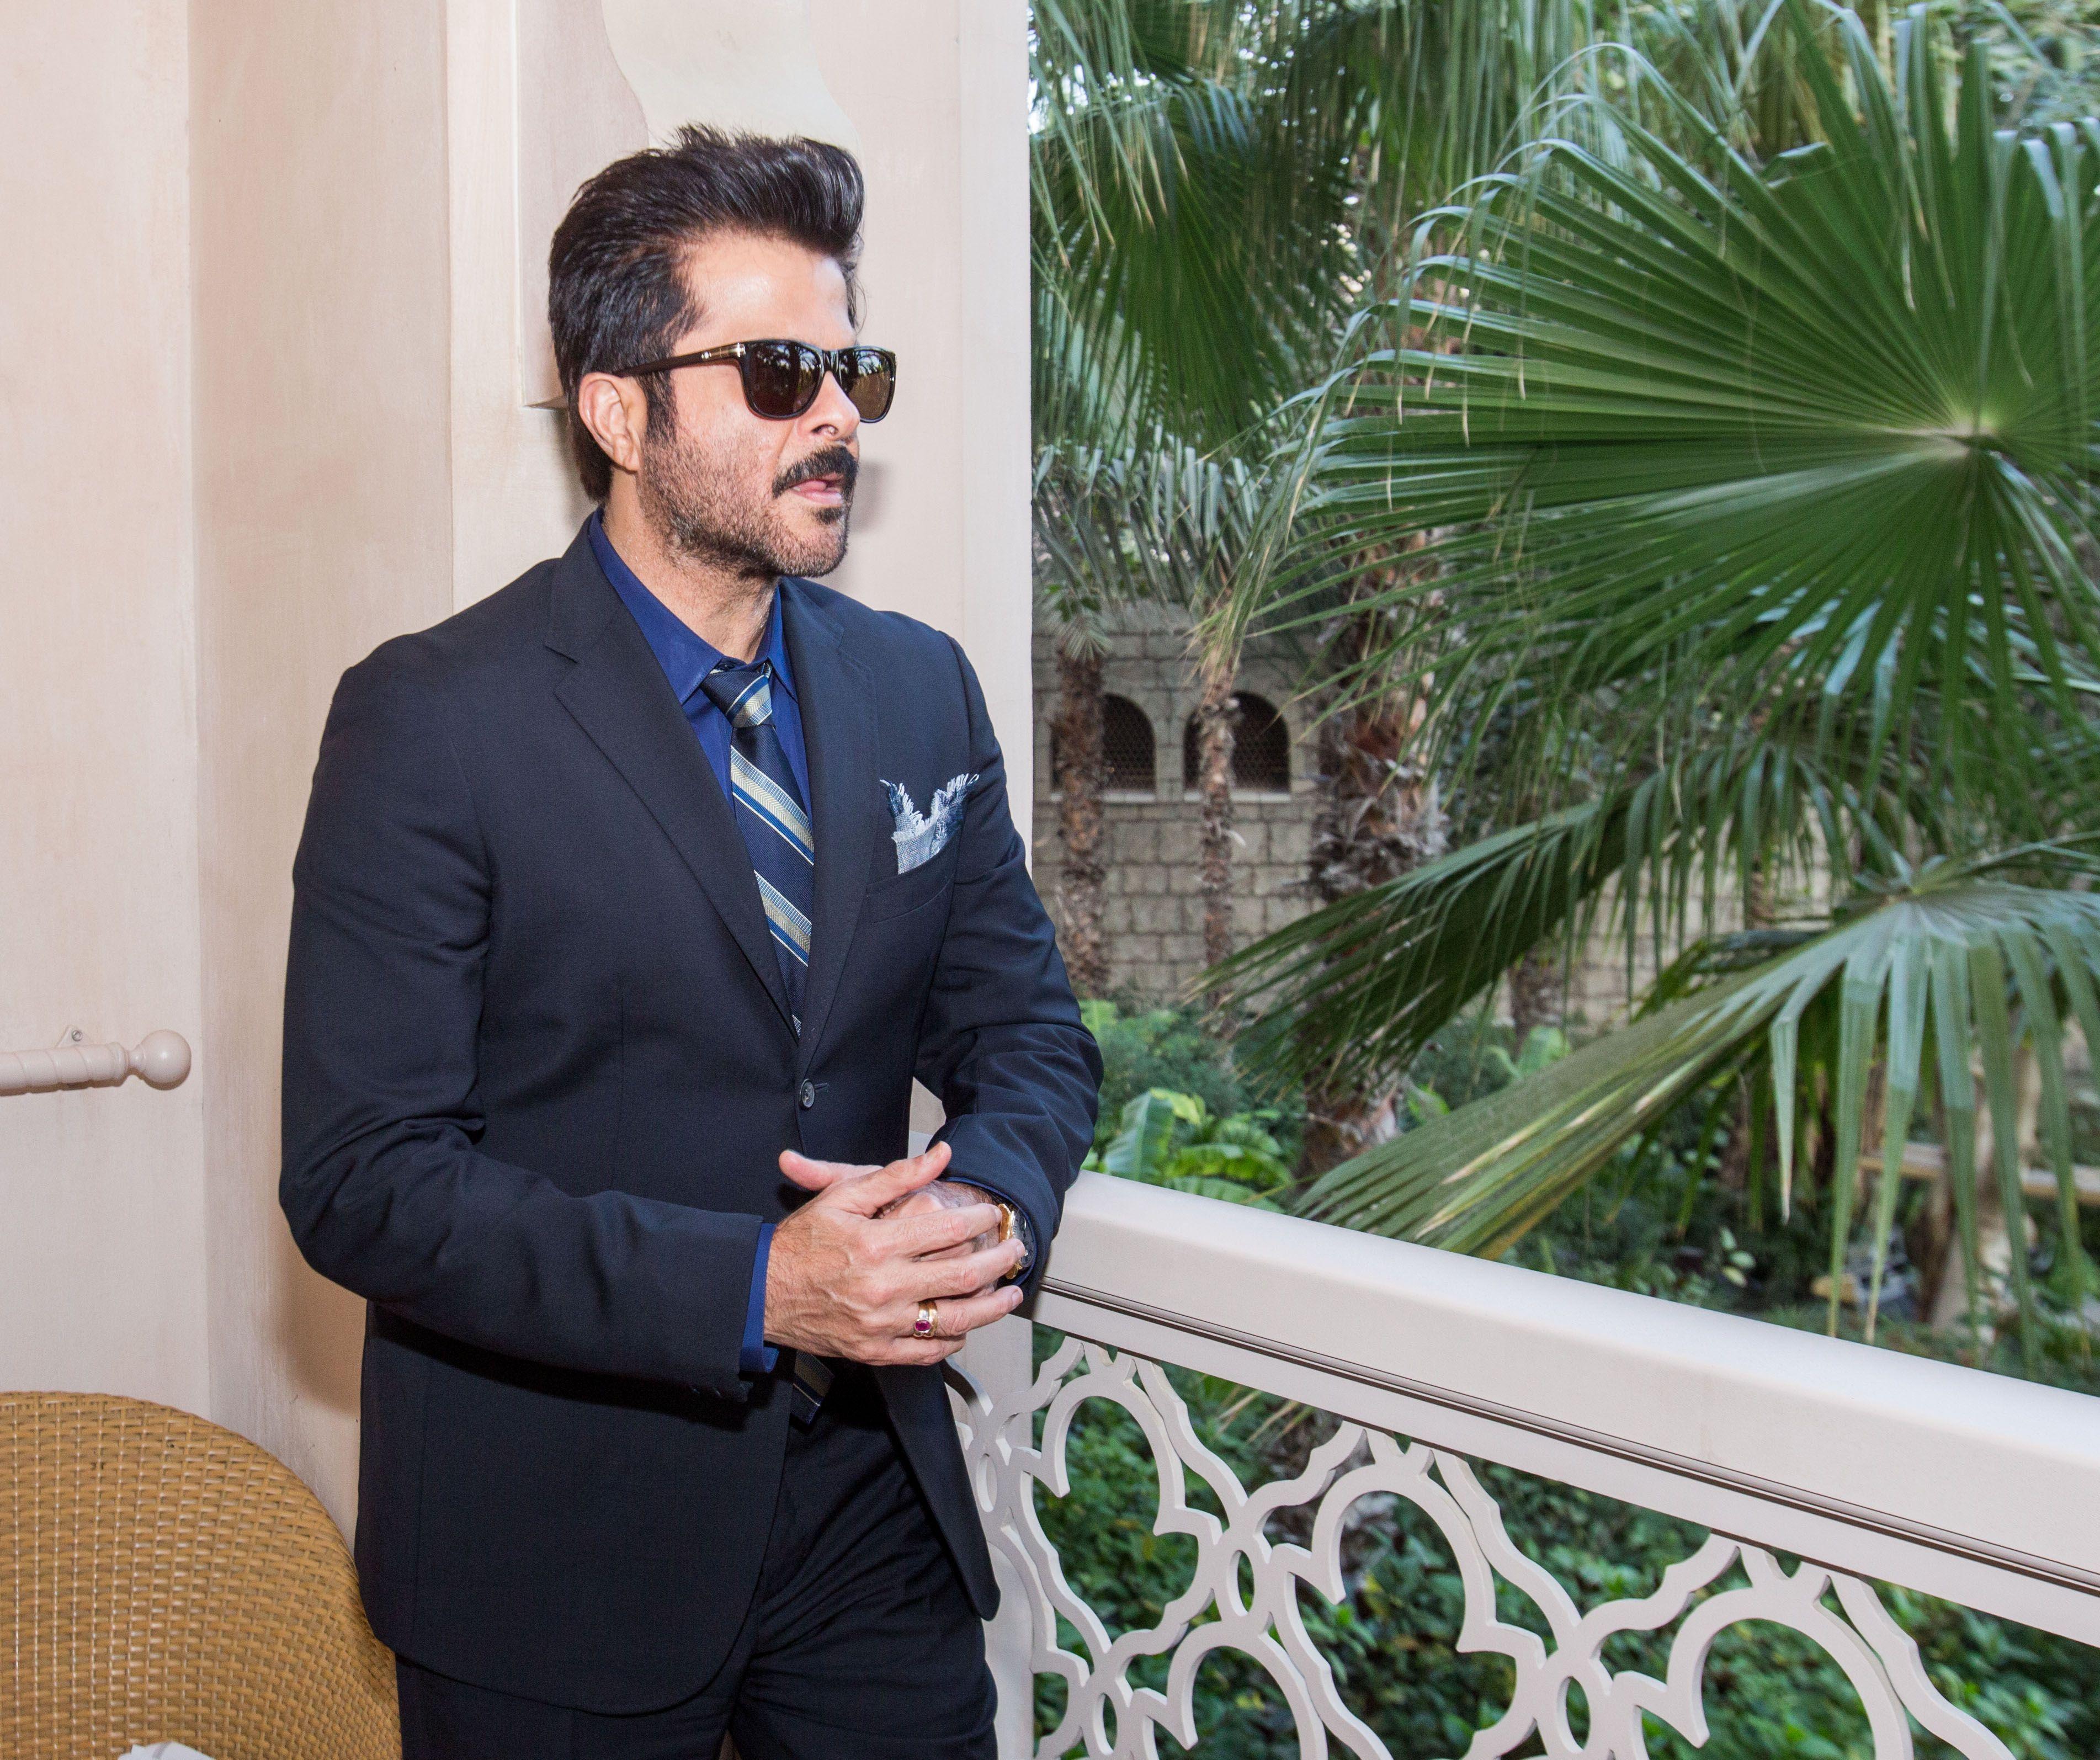 bedccb1b035 Anil Kapoor wearing  Montblanc MB502S01N  sunglasses.  Fashion  Eyewear   celebrity